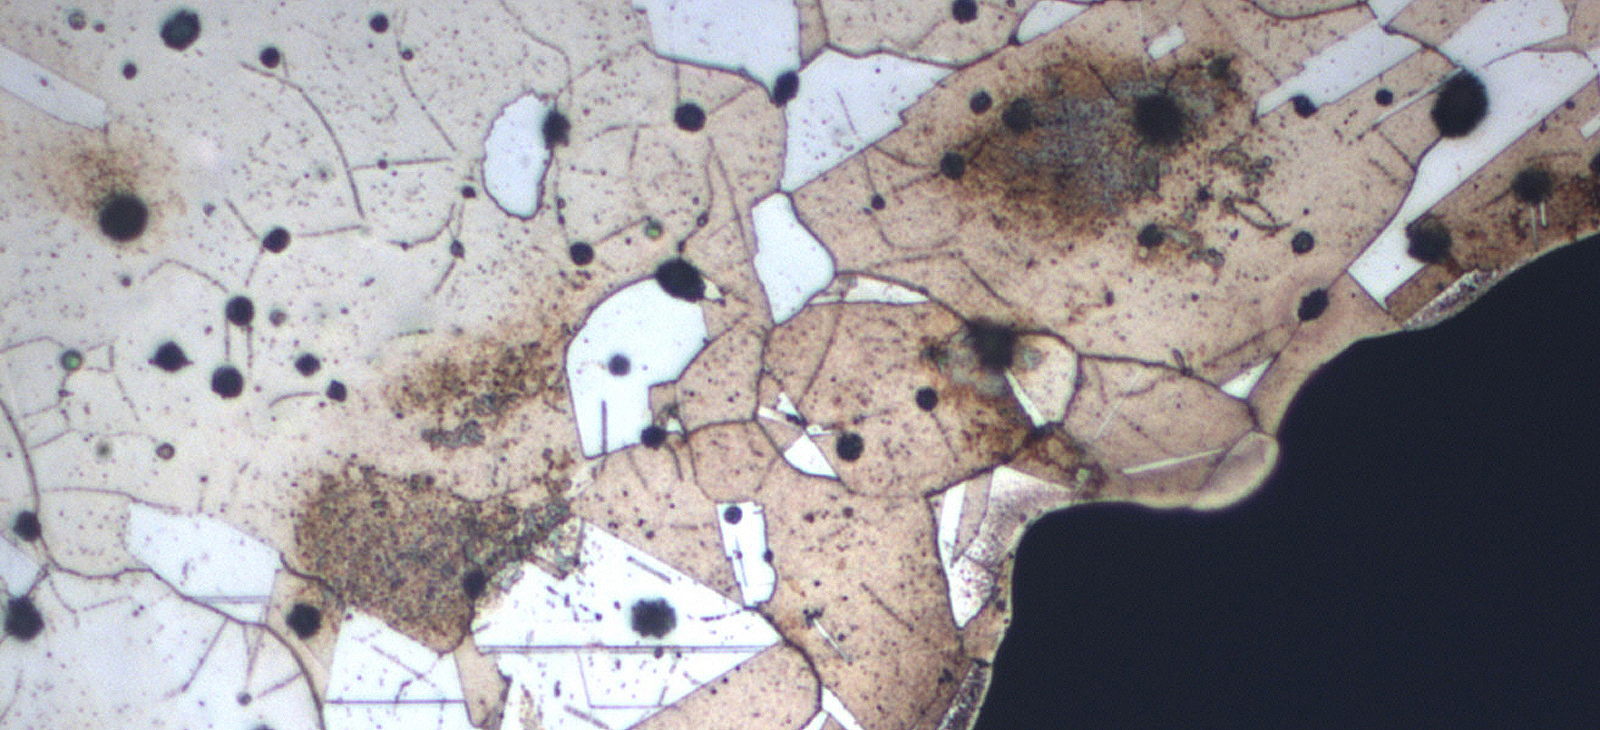 Tansmission Electron Microscopy